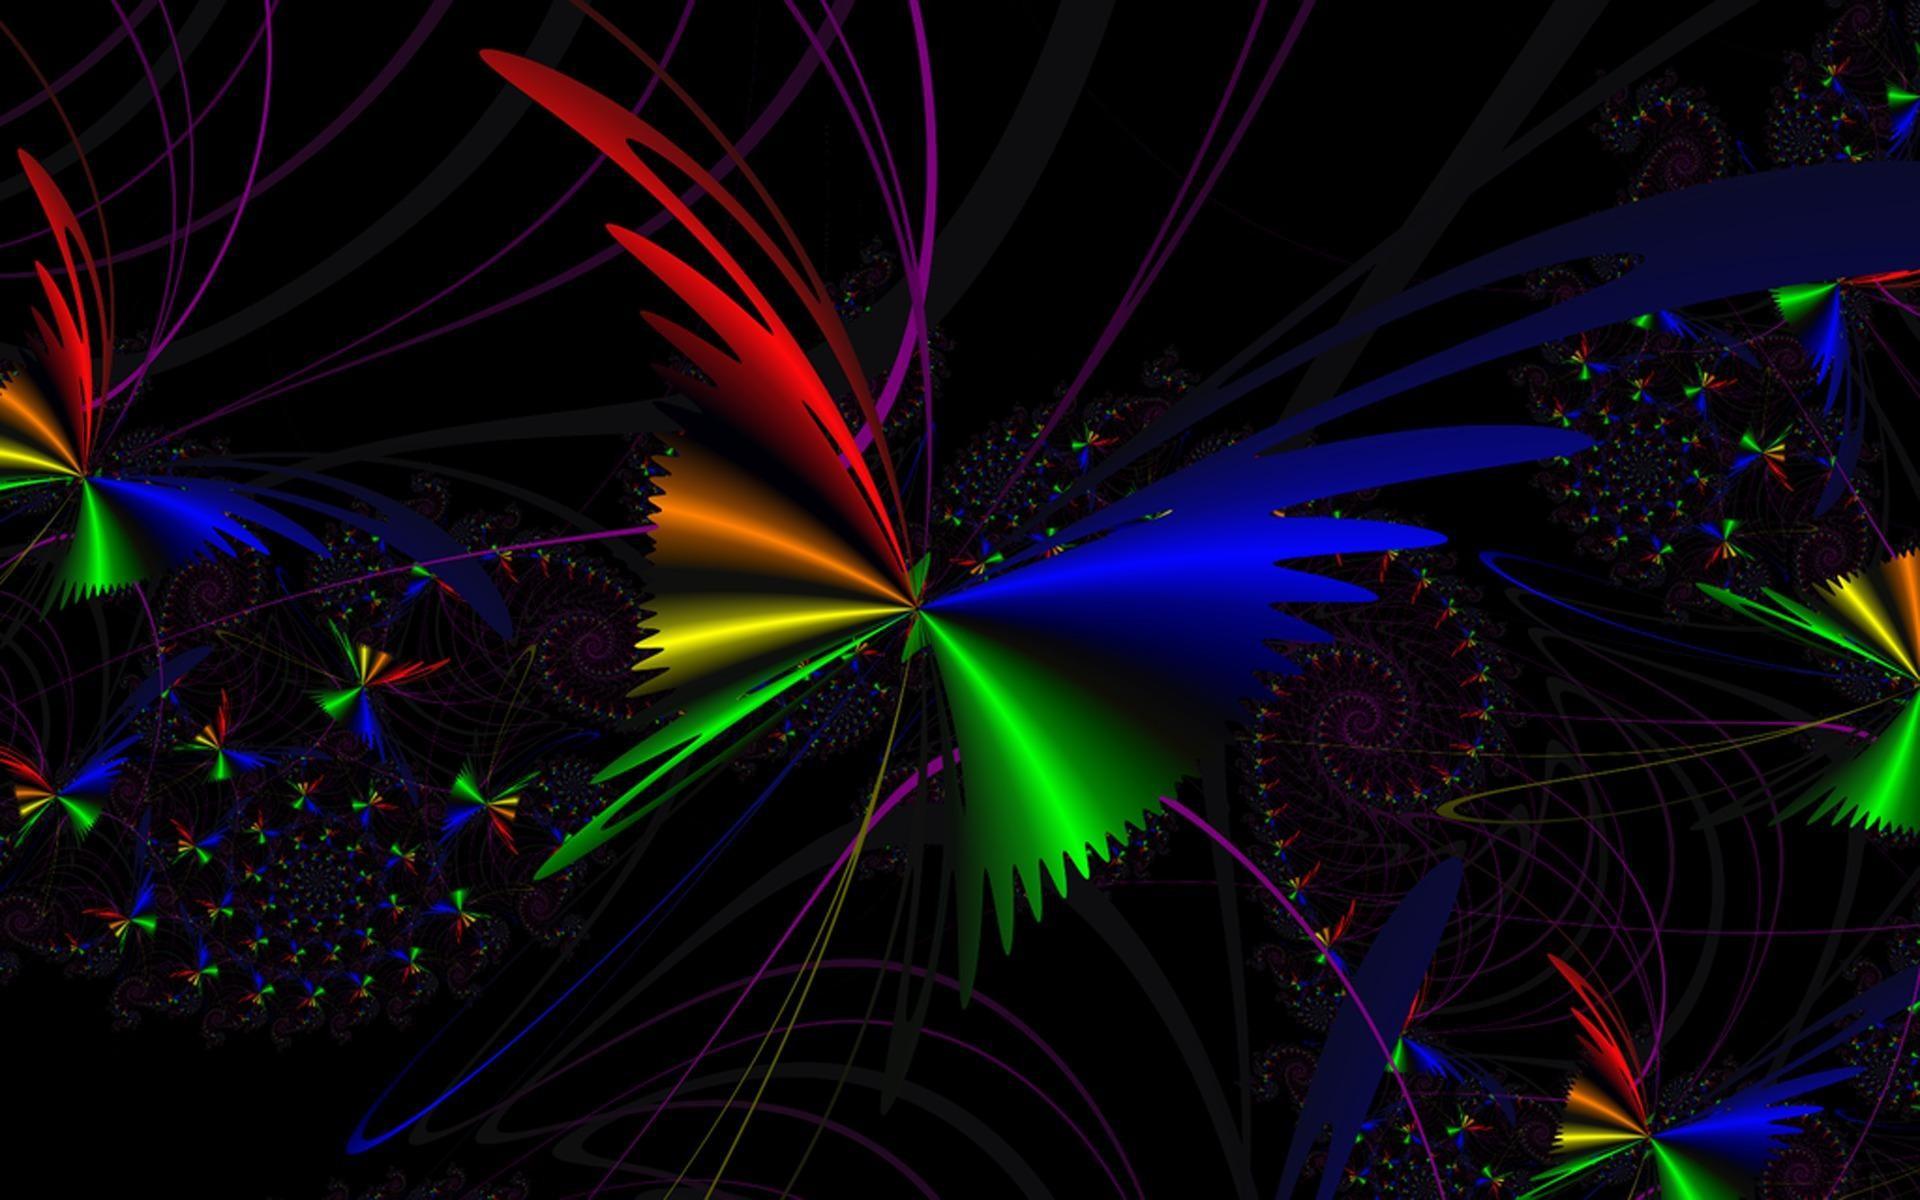 Rainbow Wallpaper Desktop: Rainbow Zebra Background Designs ·① WallpaperTag